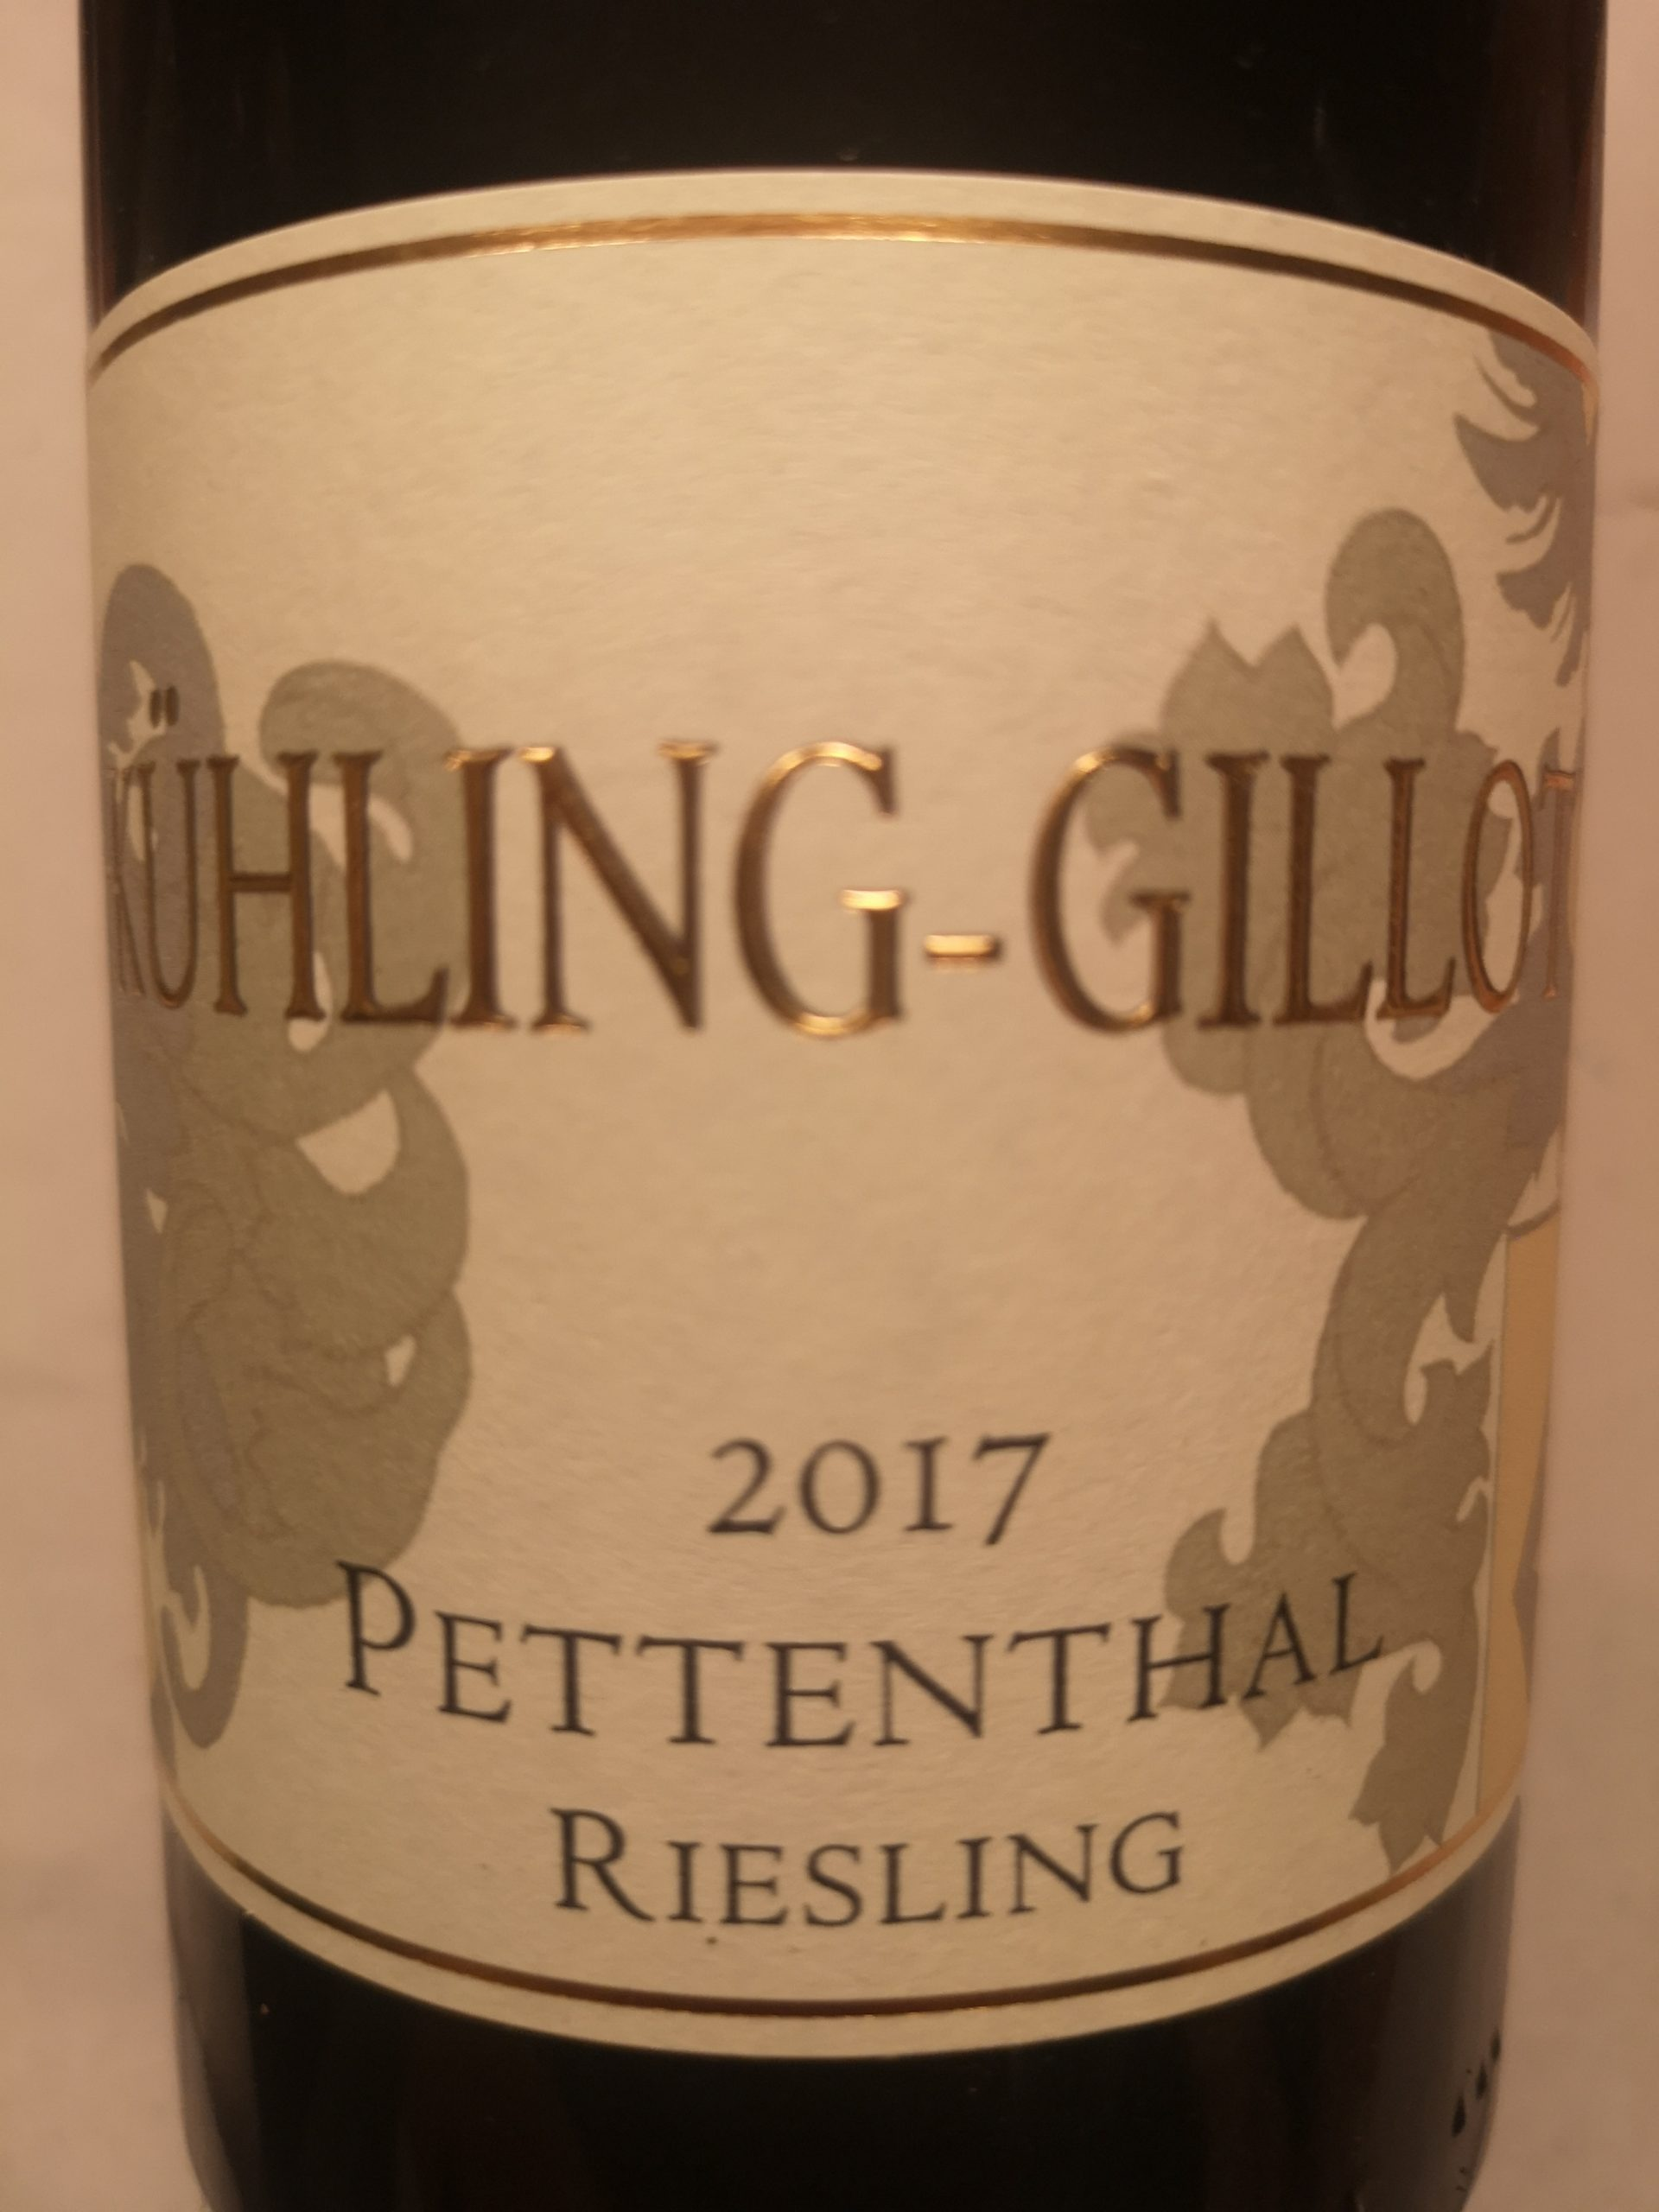 2017 Riesling Pettenthal GG | Kühling-Gillot